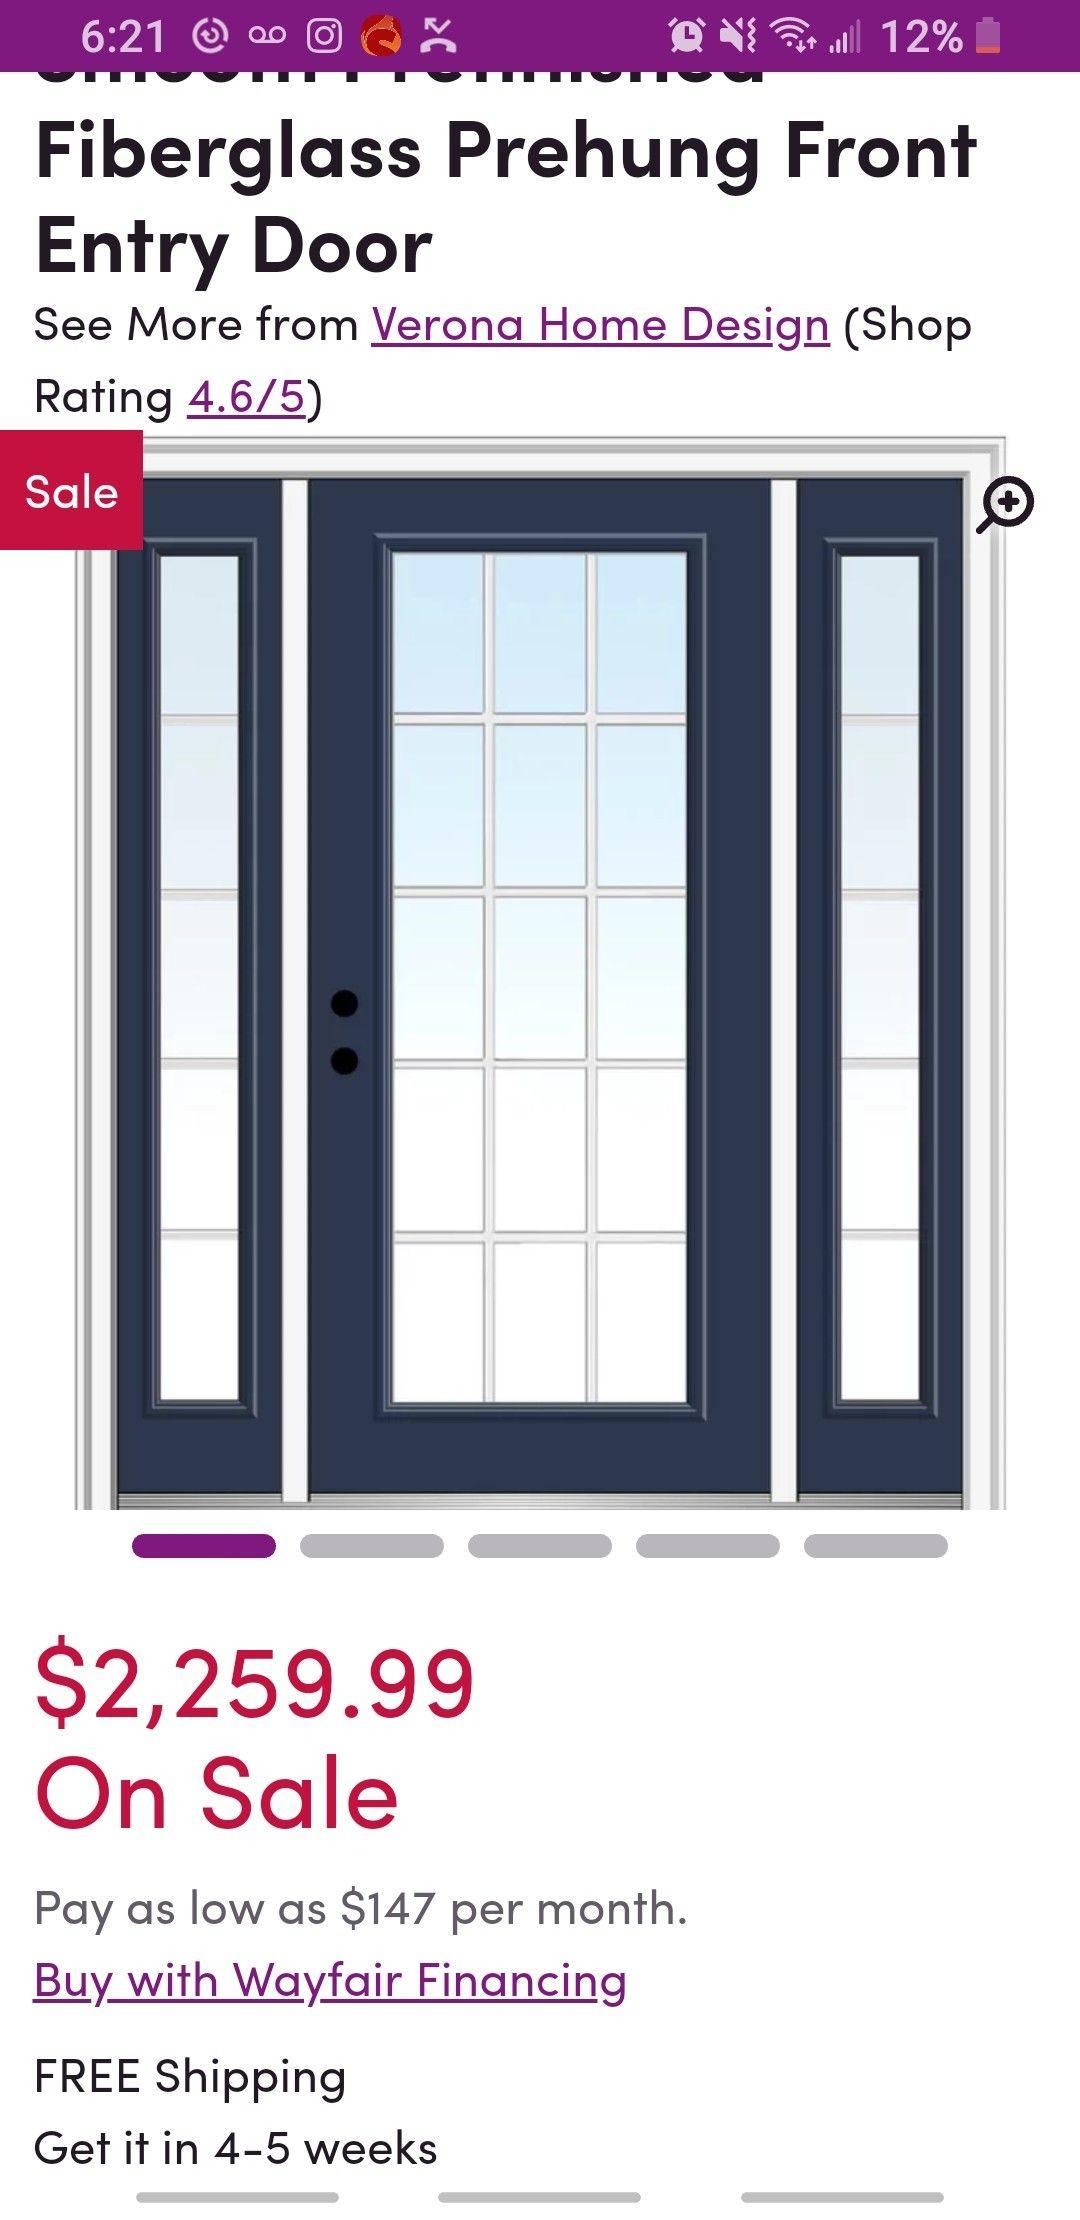 Smooth Prefinished Fiberglass Prehung Front Entry Door Front Entry Doors Entry Doors Modern Exterior Doors